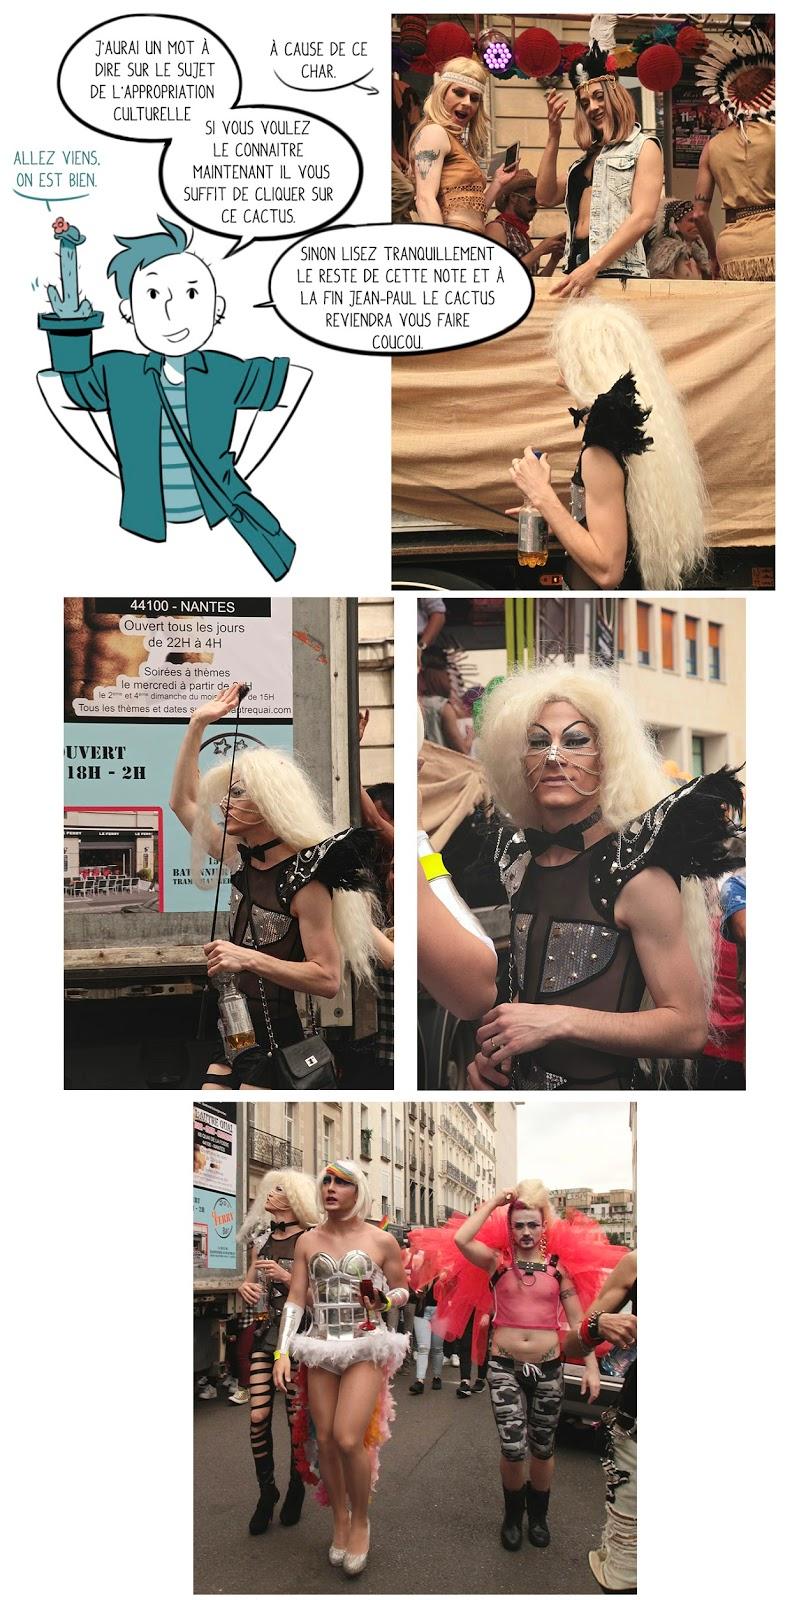 http://bande-de-dechets.blogspot.fr/2016/07/lappropriation-cuturelle-la-gay-pride.html